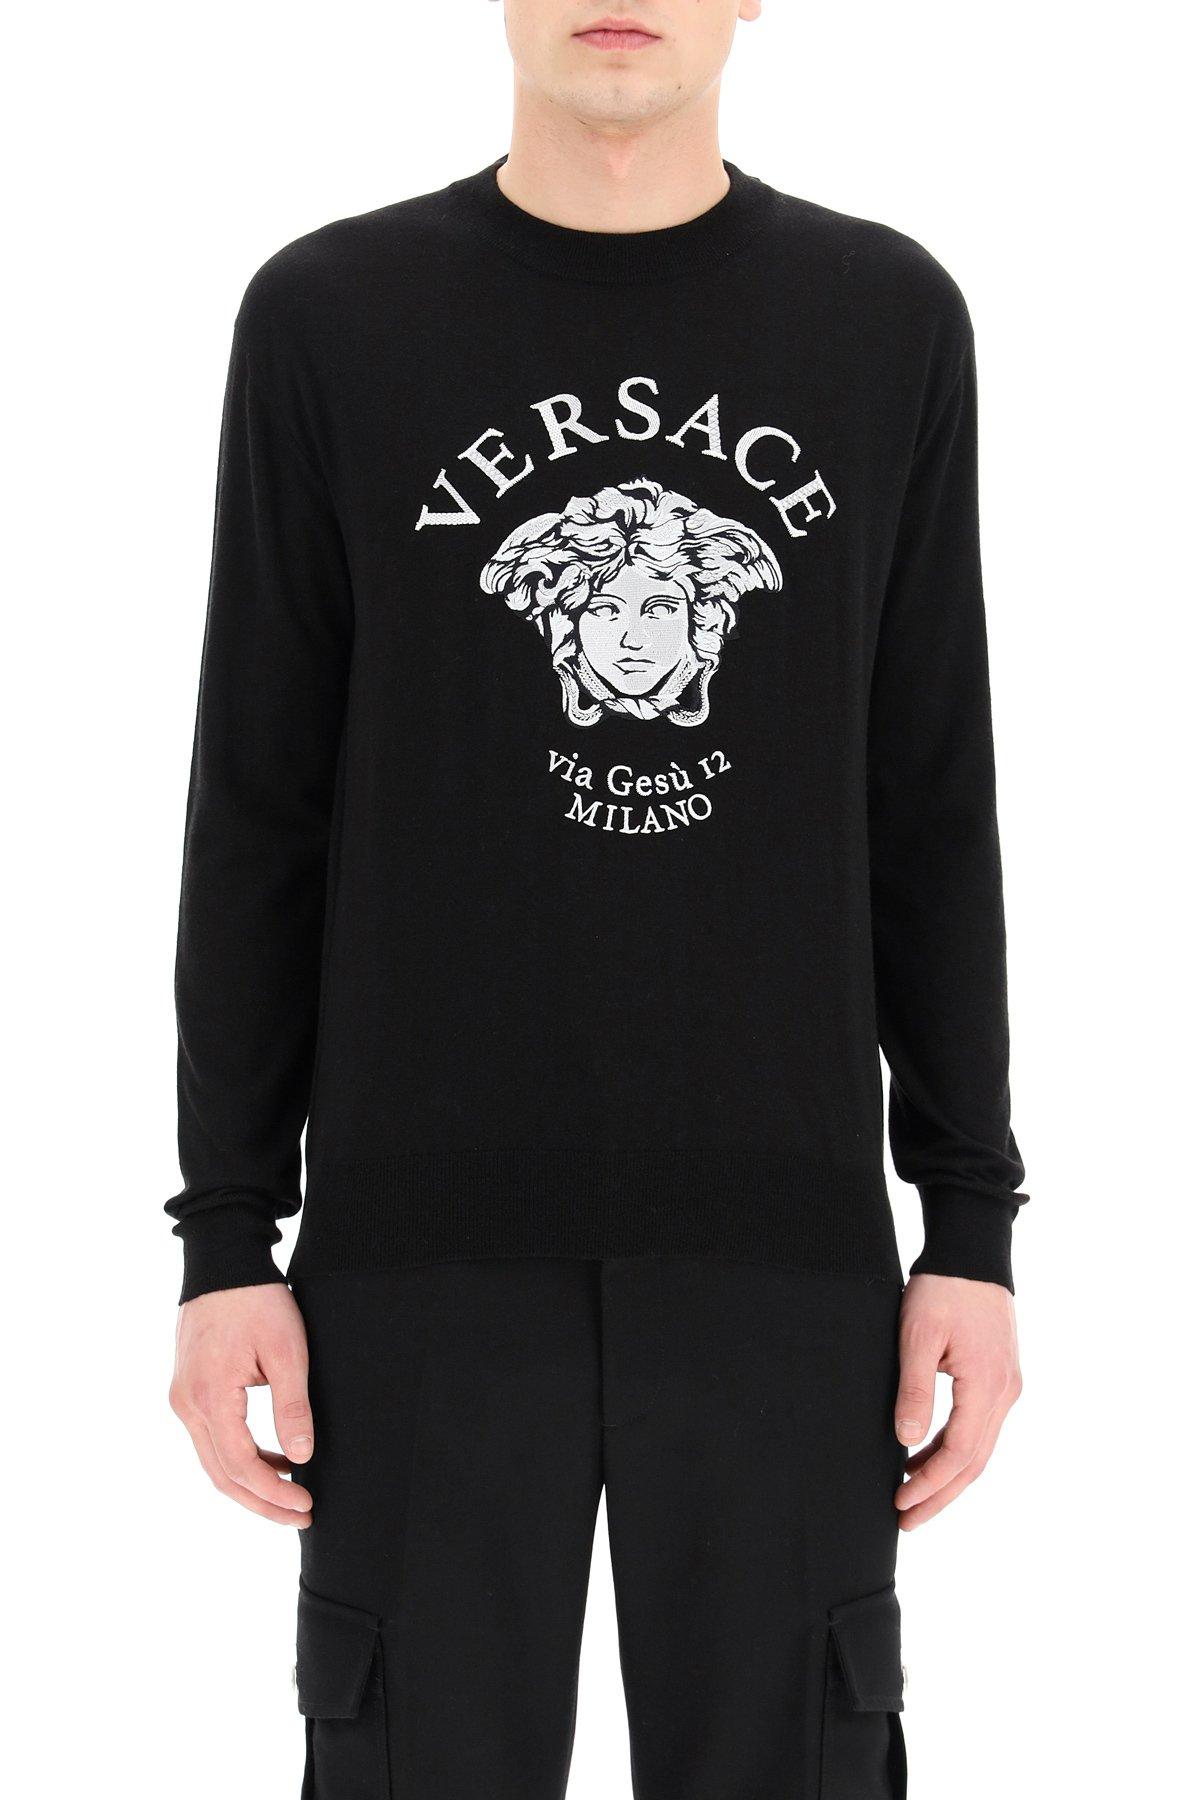 Versace pullover intarsio medusa via gesù12